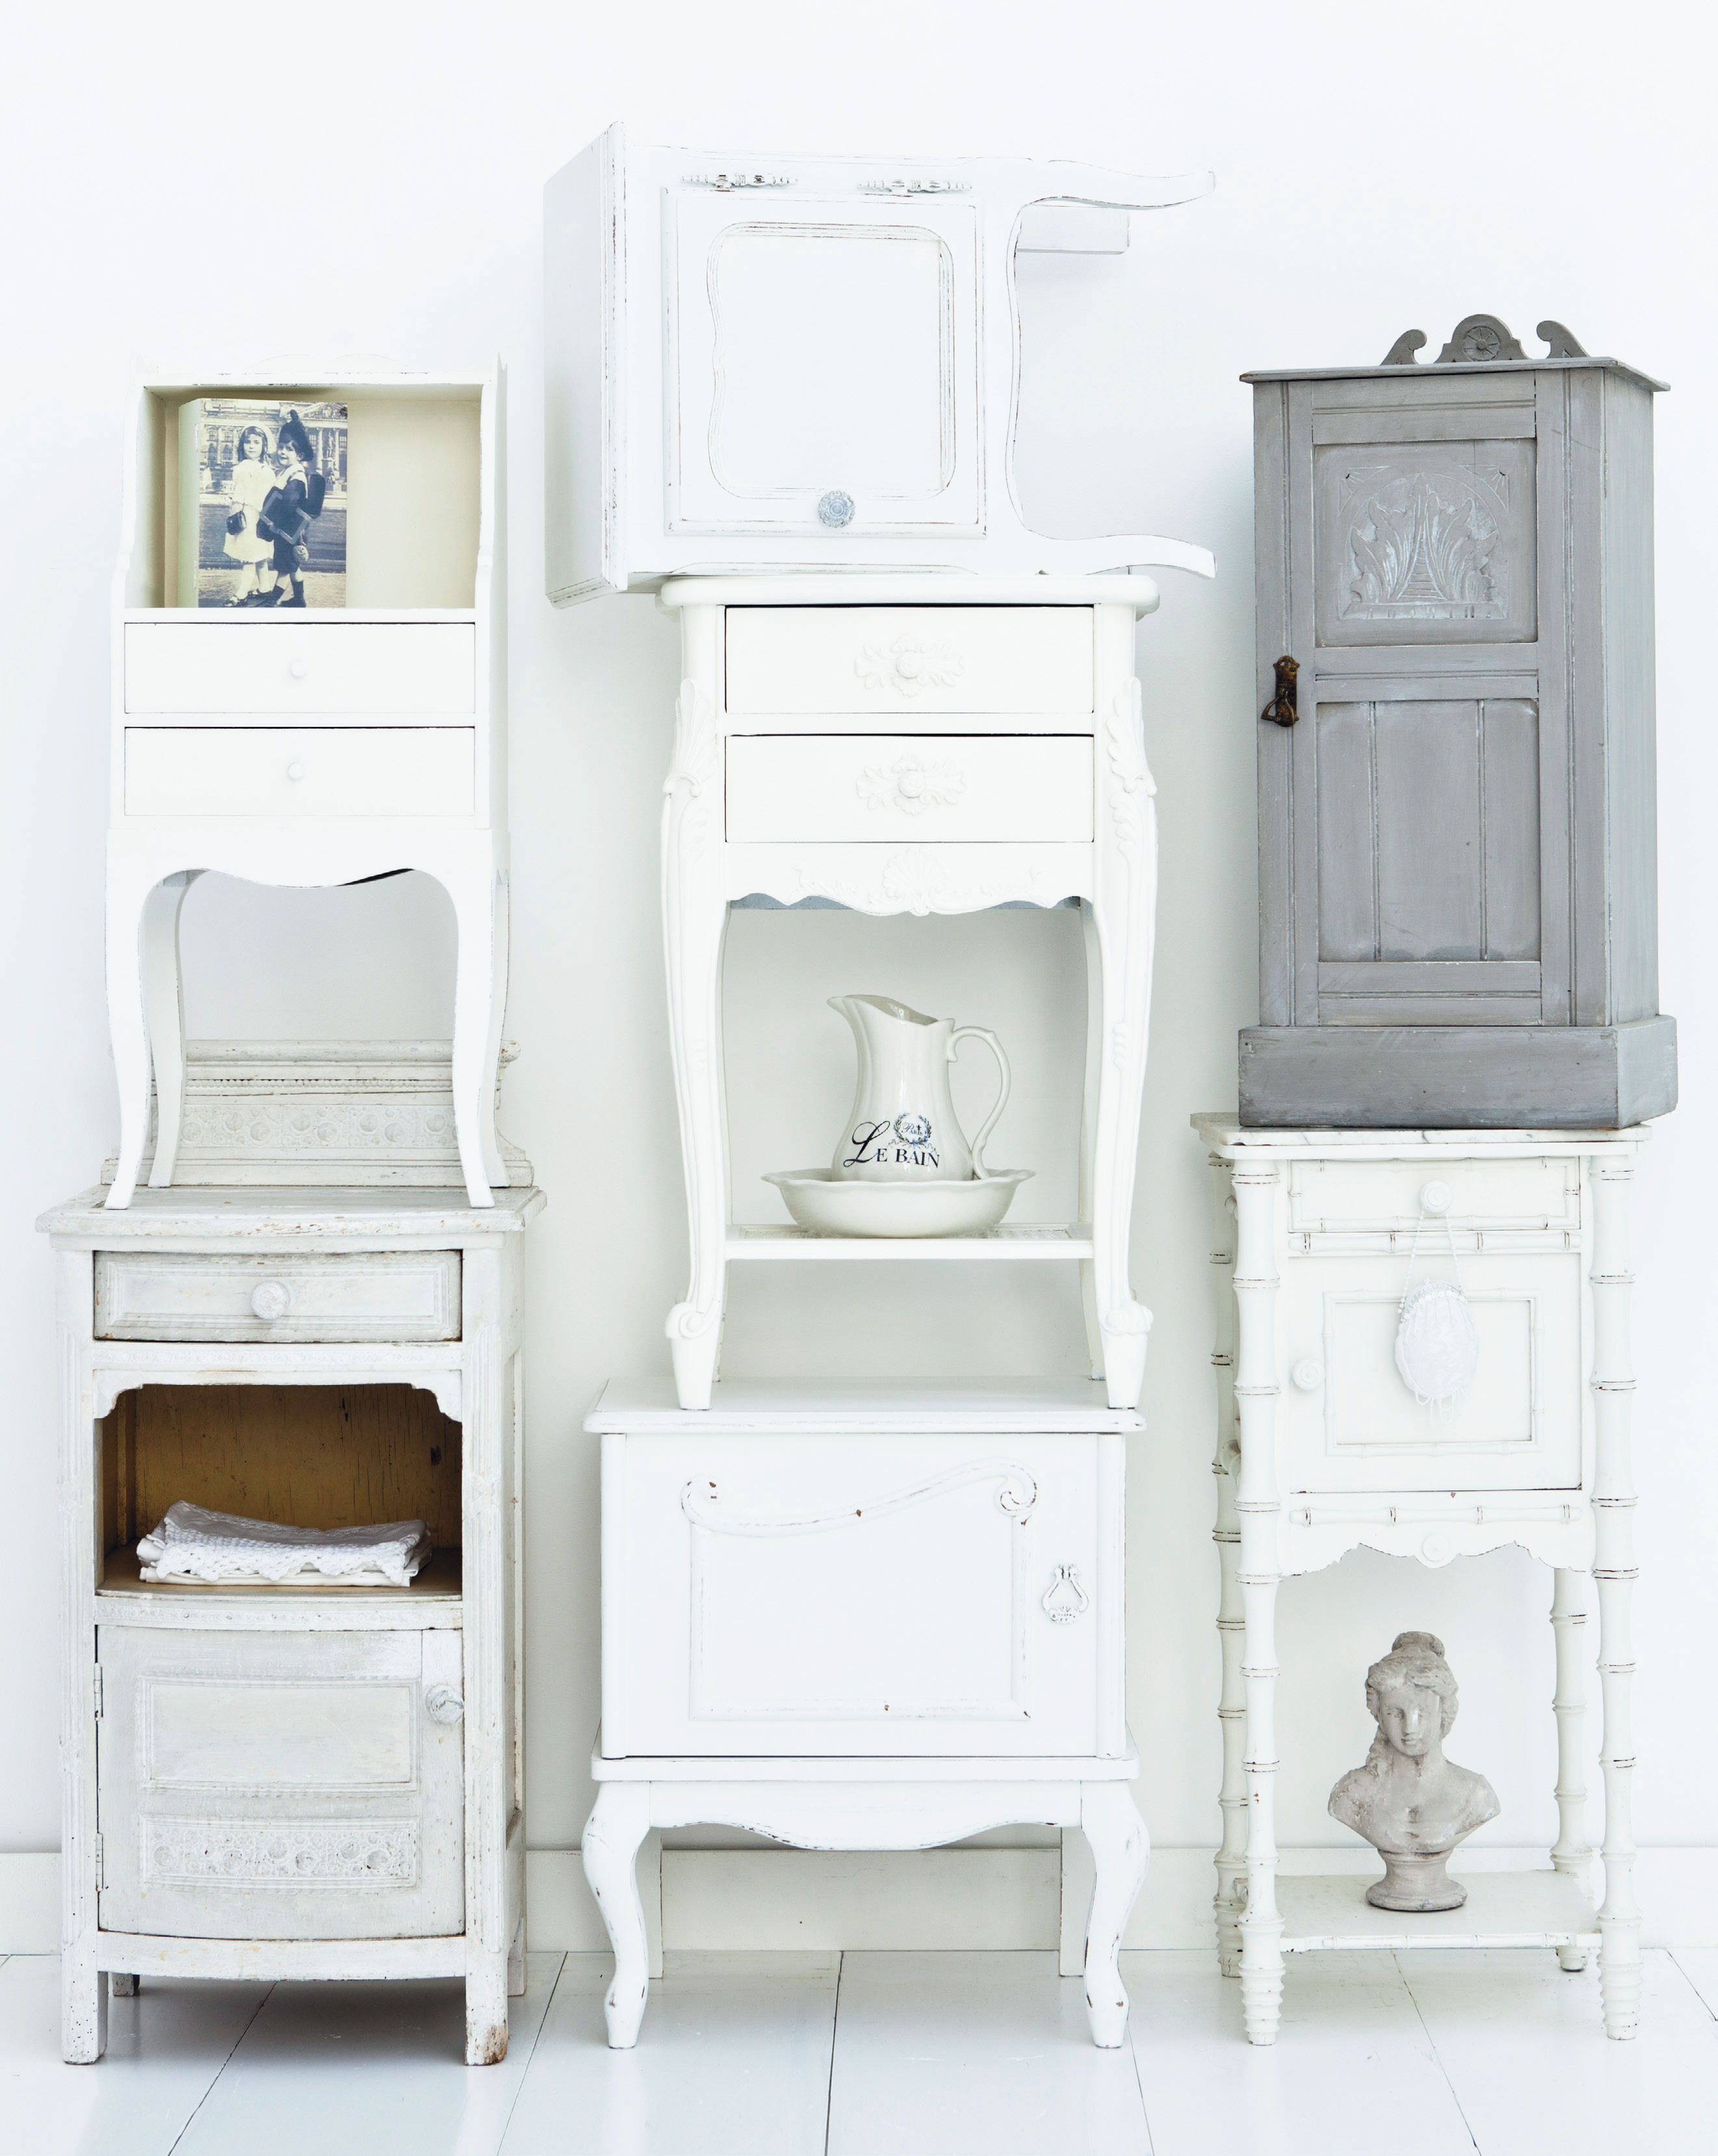 Stapelgek op brocante nachtkastjes  Interieur Inspiratie  Pinterest